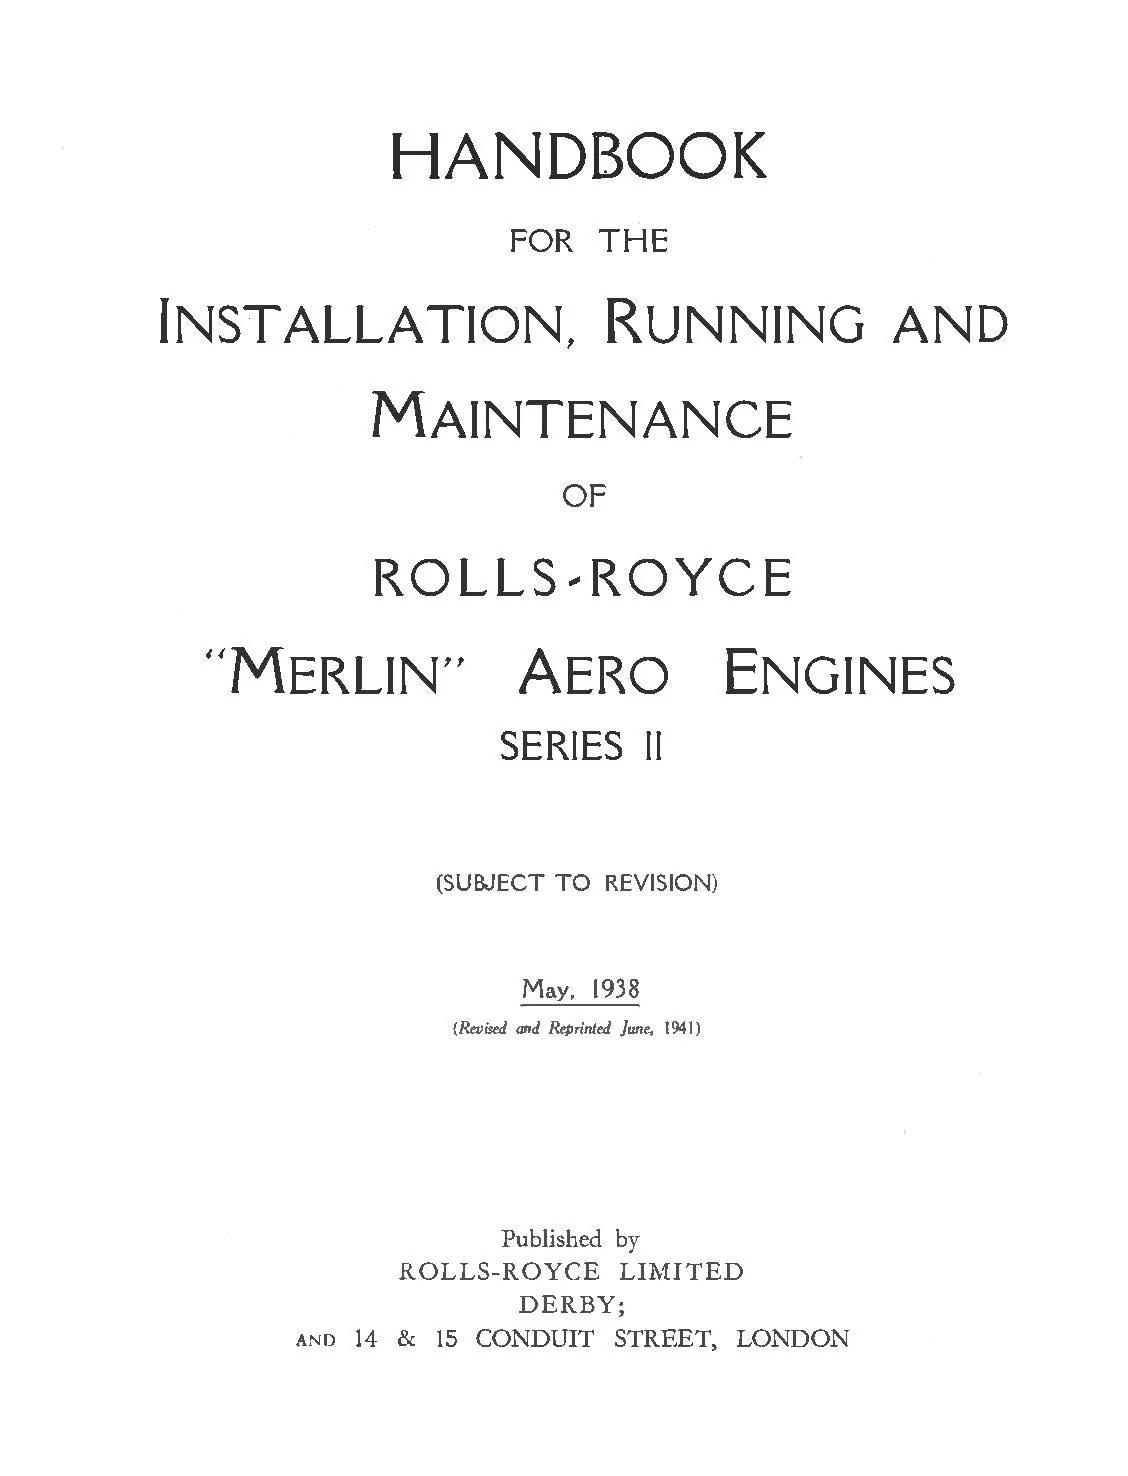 medium resolution of load image into gallery viewer rolls royce merlin series ii manual handbook for